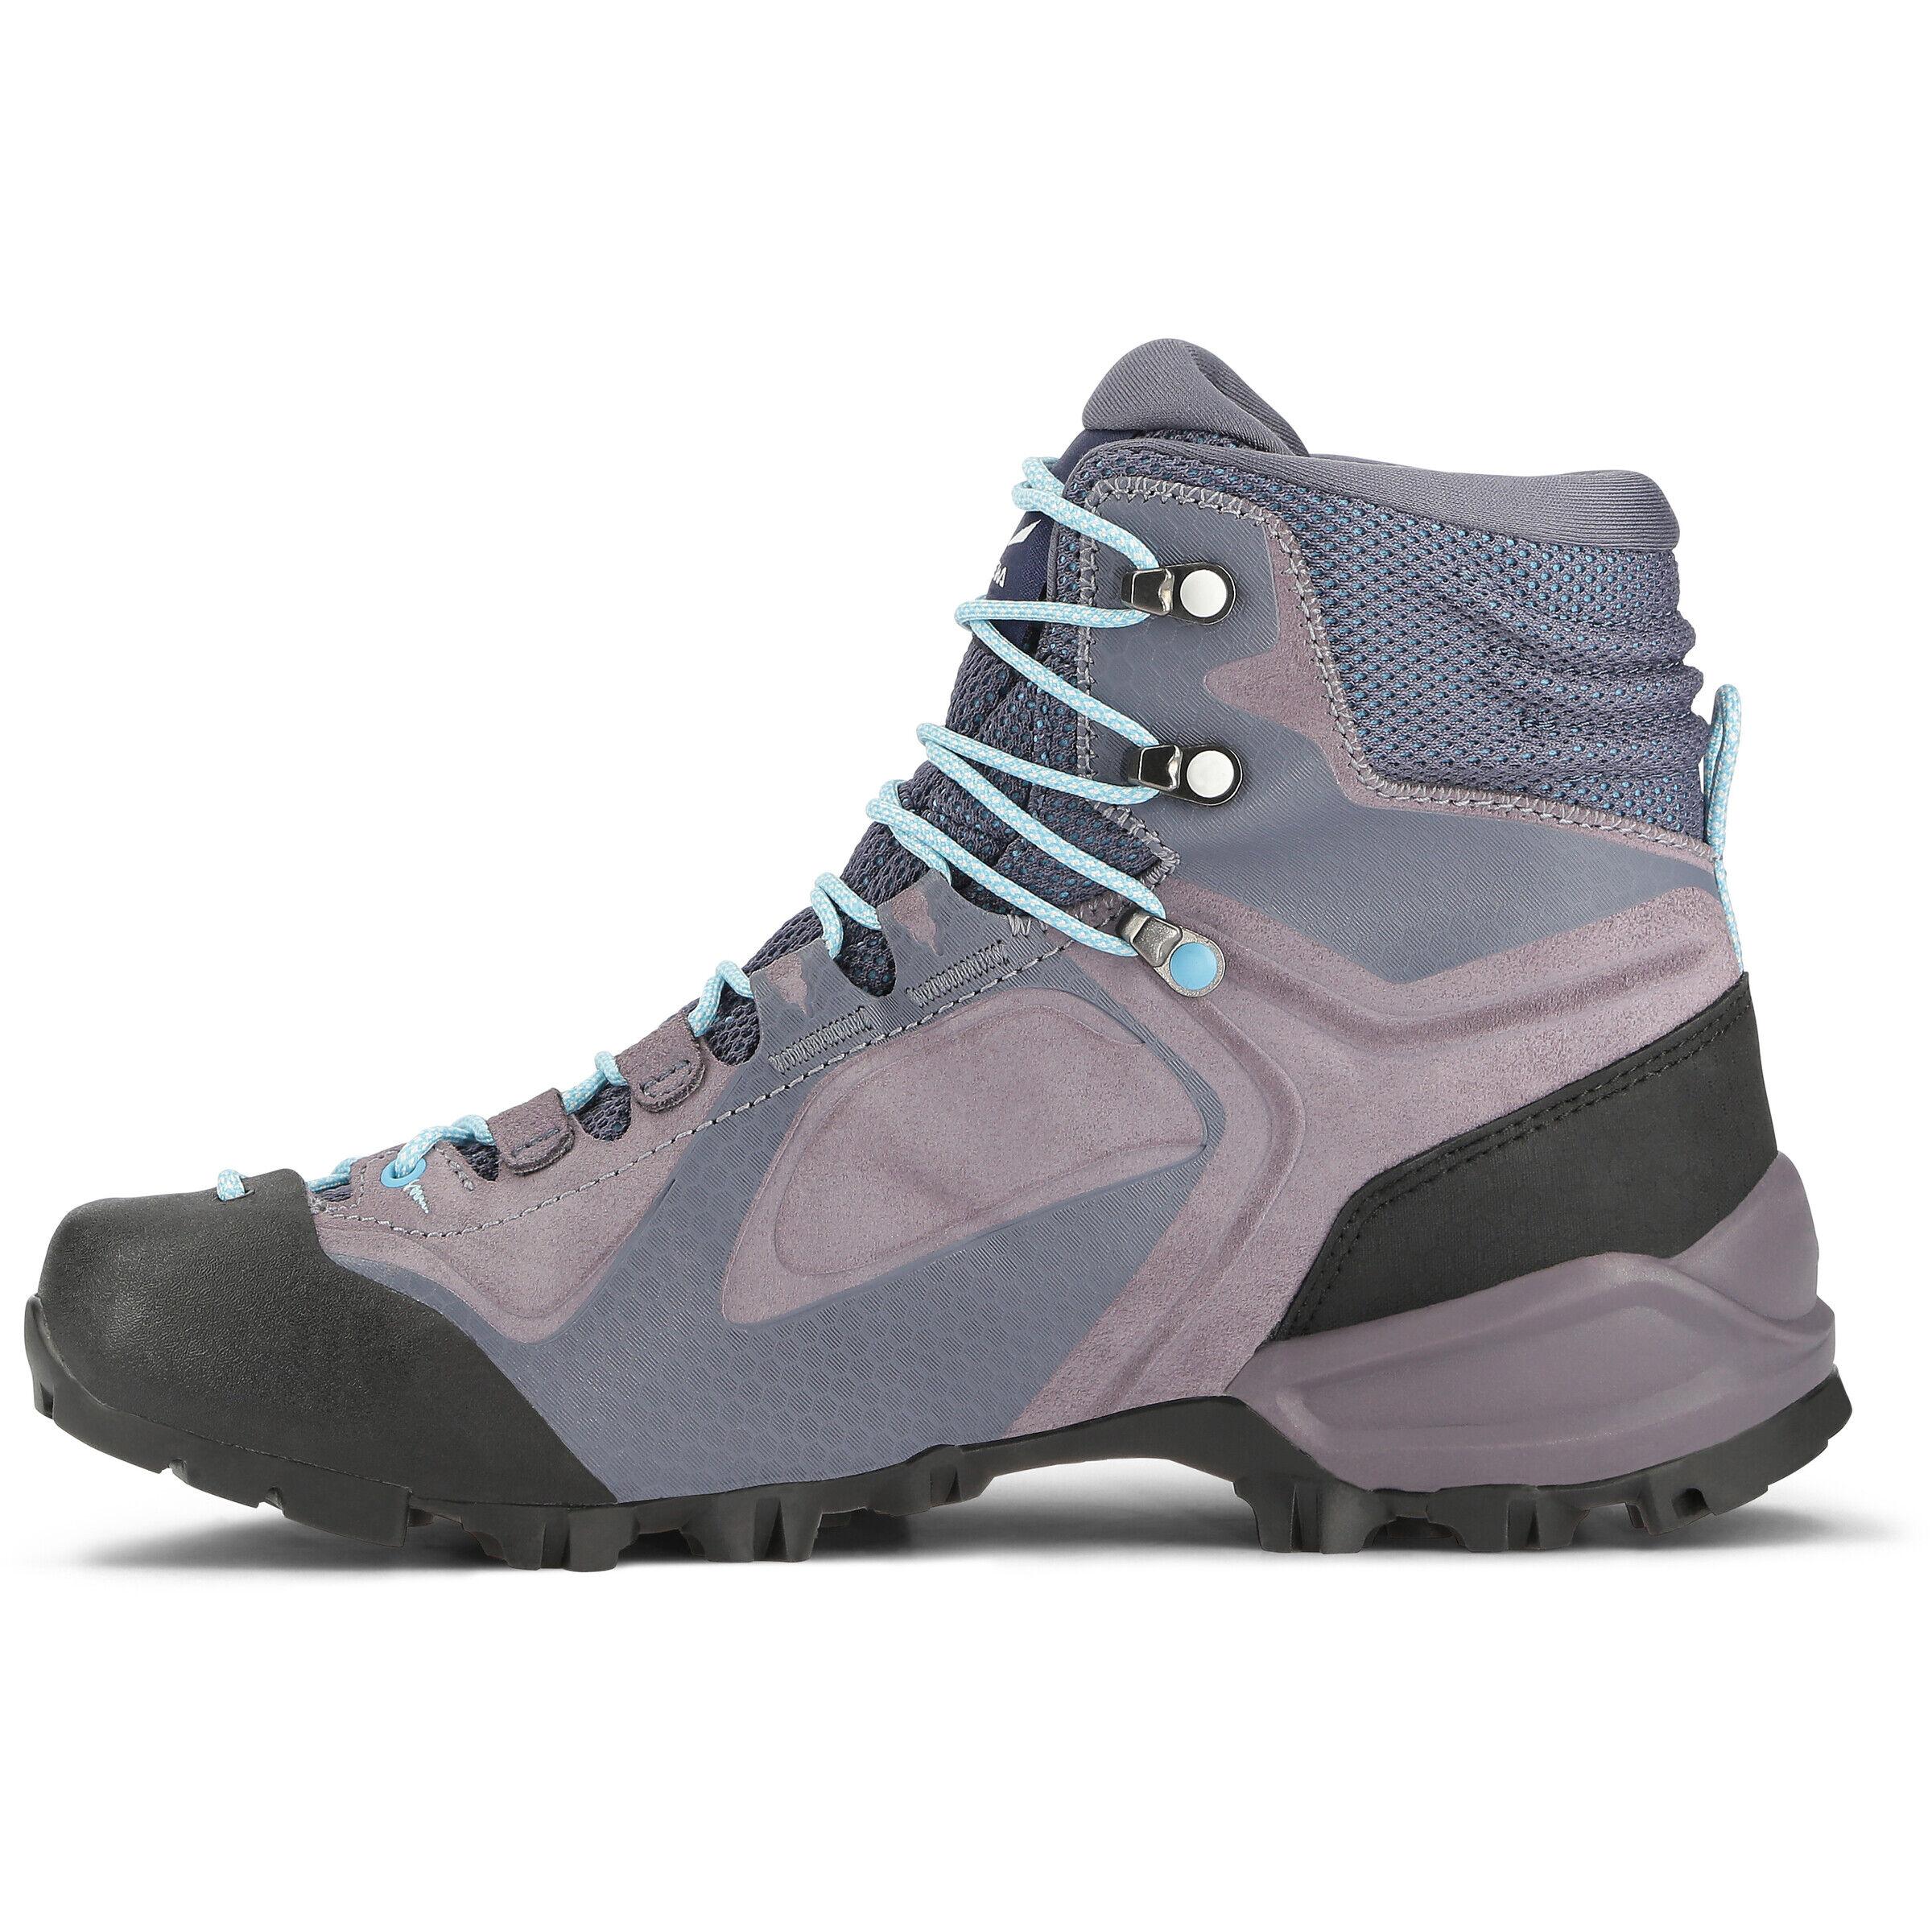 SALEWA Alpenviolet GTX Mid Cut Schuhe Damen grisailleethernal blue